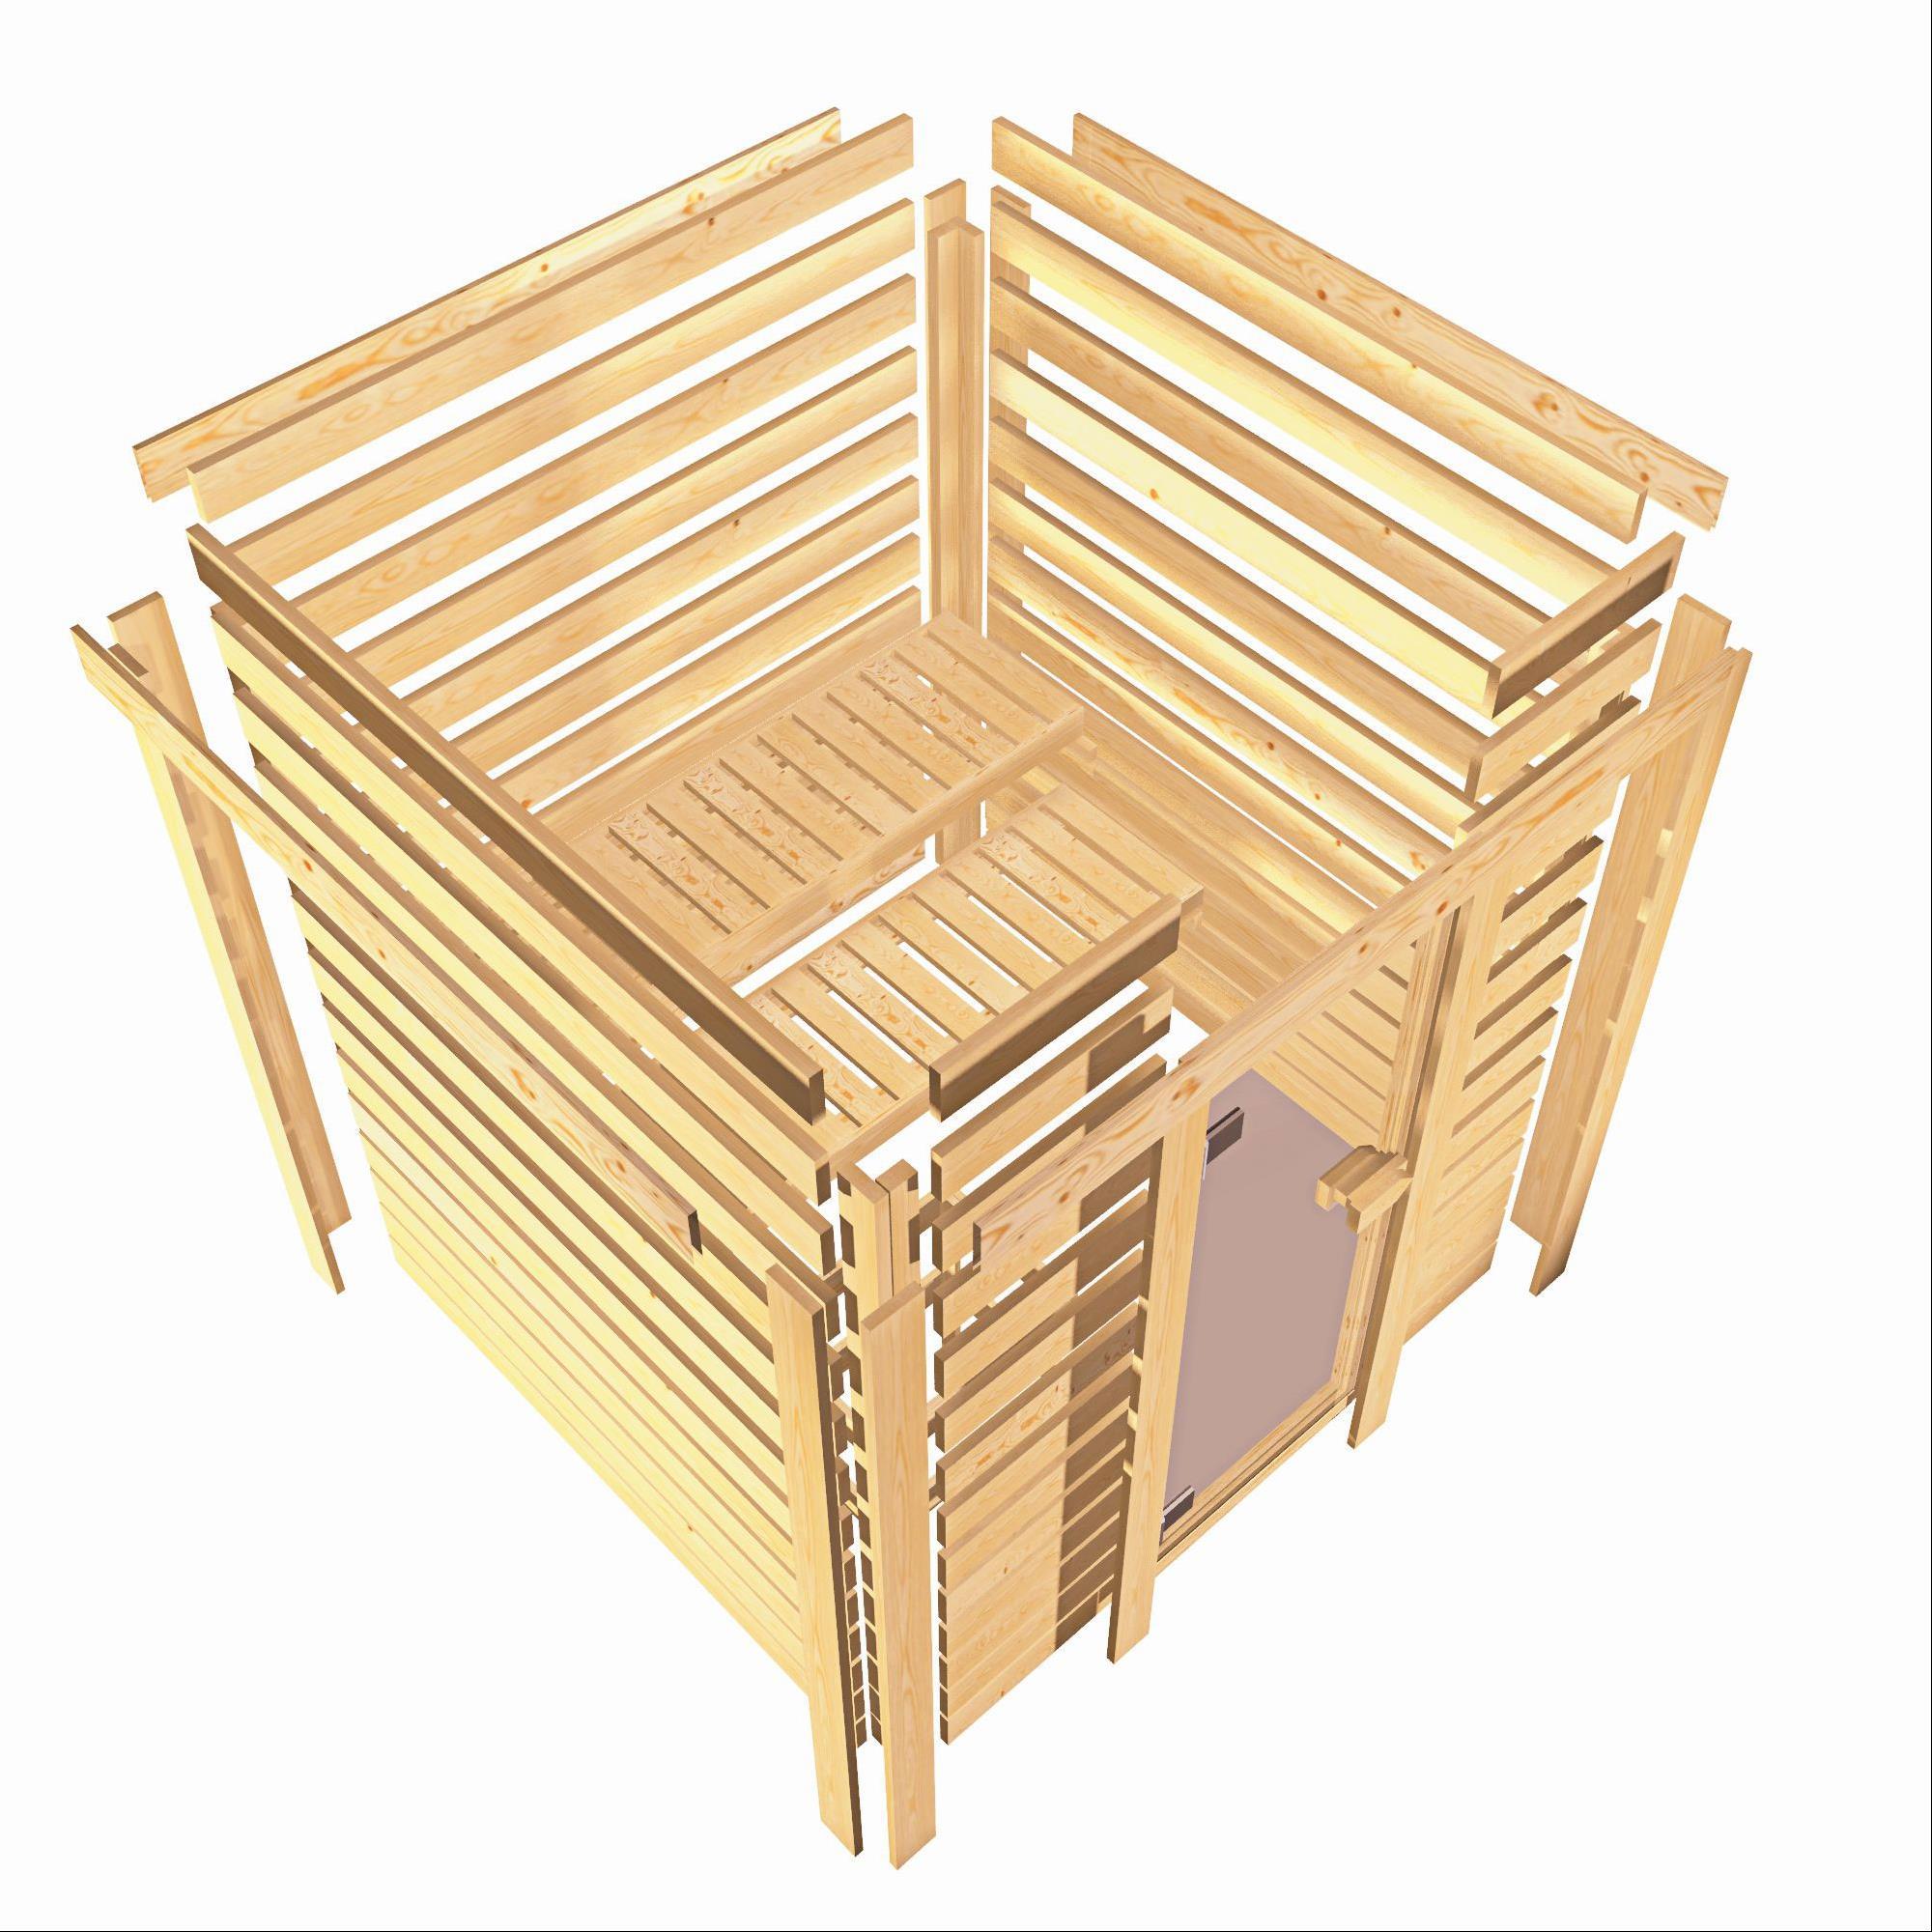 Woodfeeling Sauna Svenja 38mm Bio Saunaofen 9kW Dachkranz Holztür Bild 5